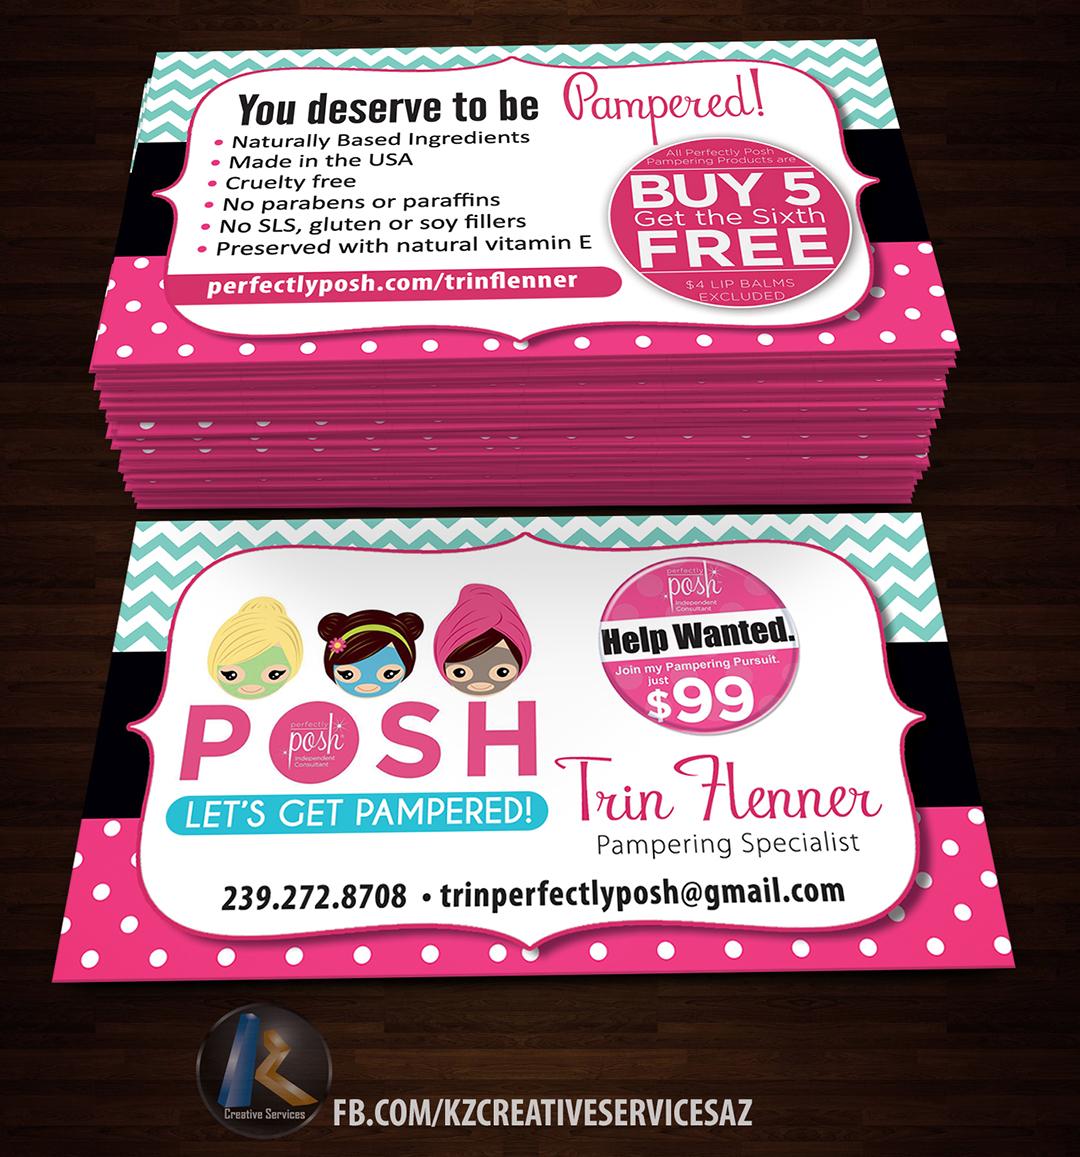 Perfectly posh business cards 16 kz creative services online perfectly posh business cards 16 colourmoves